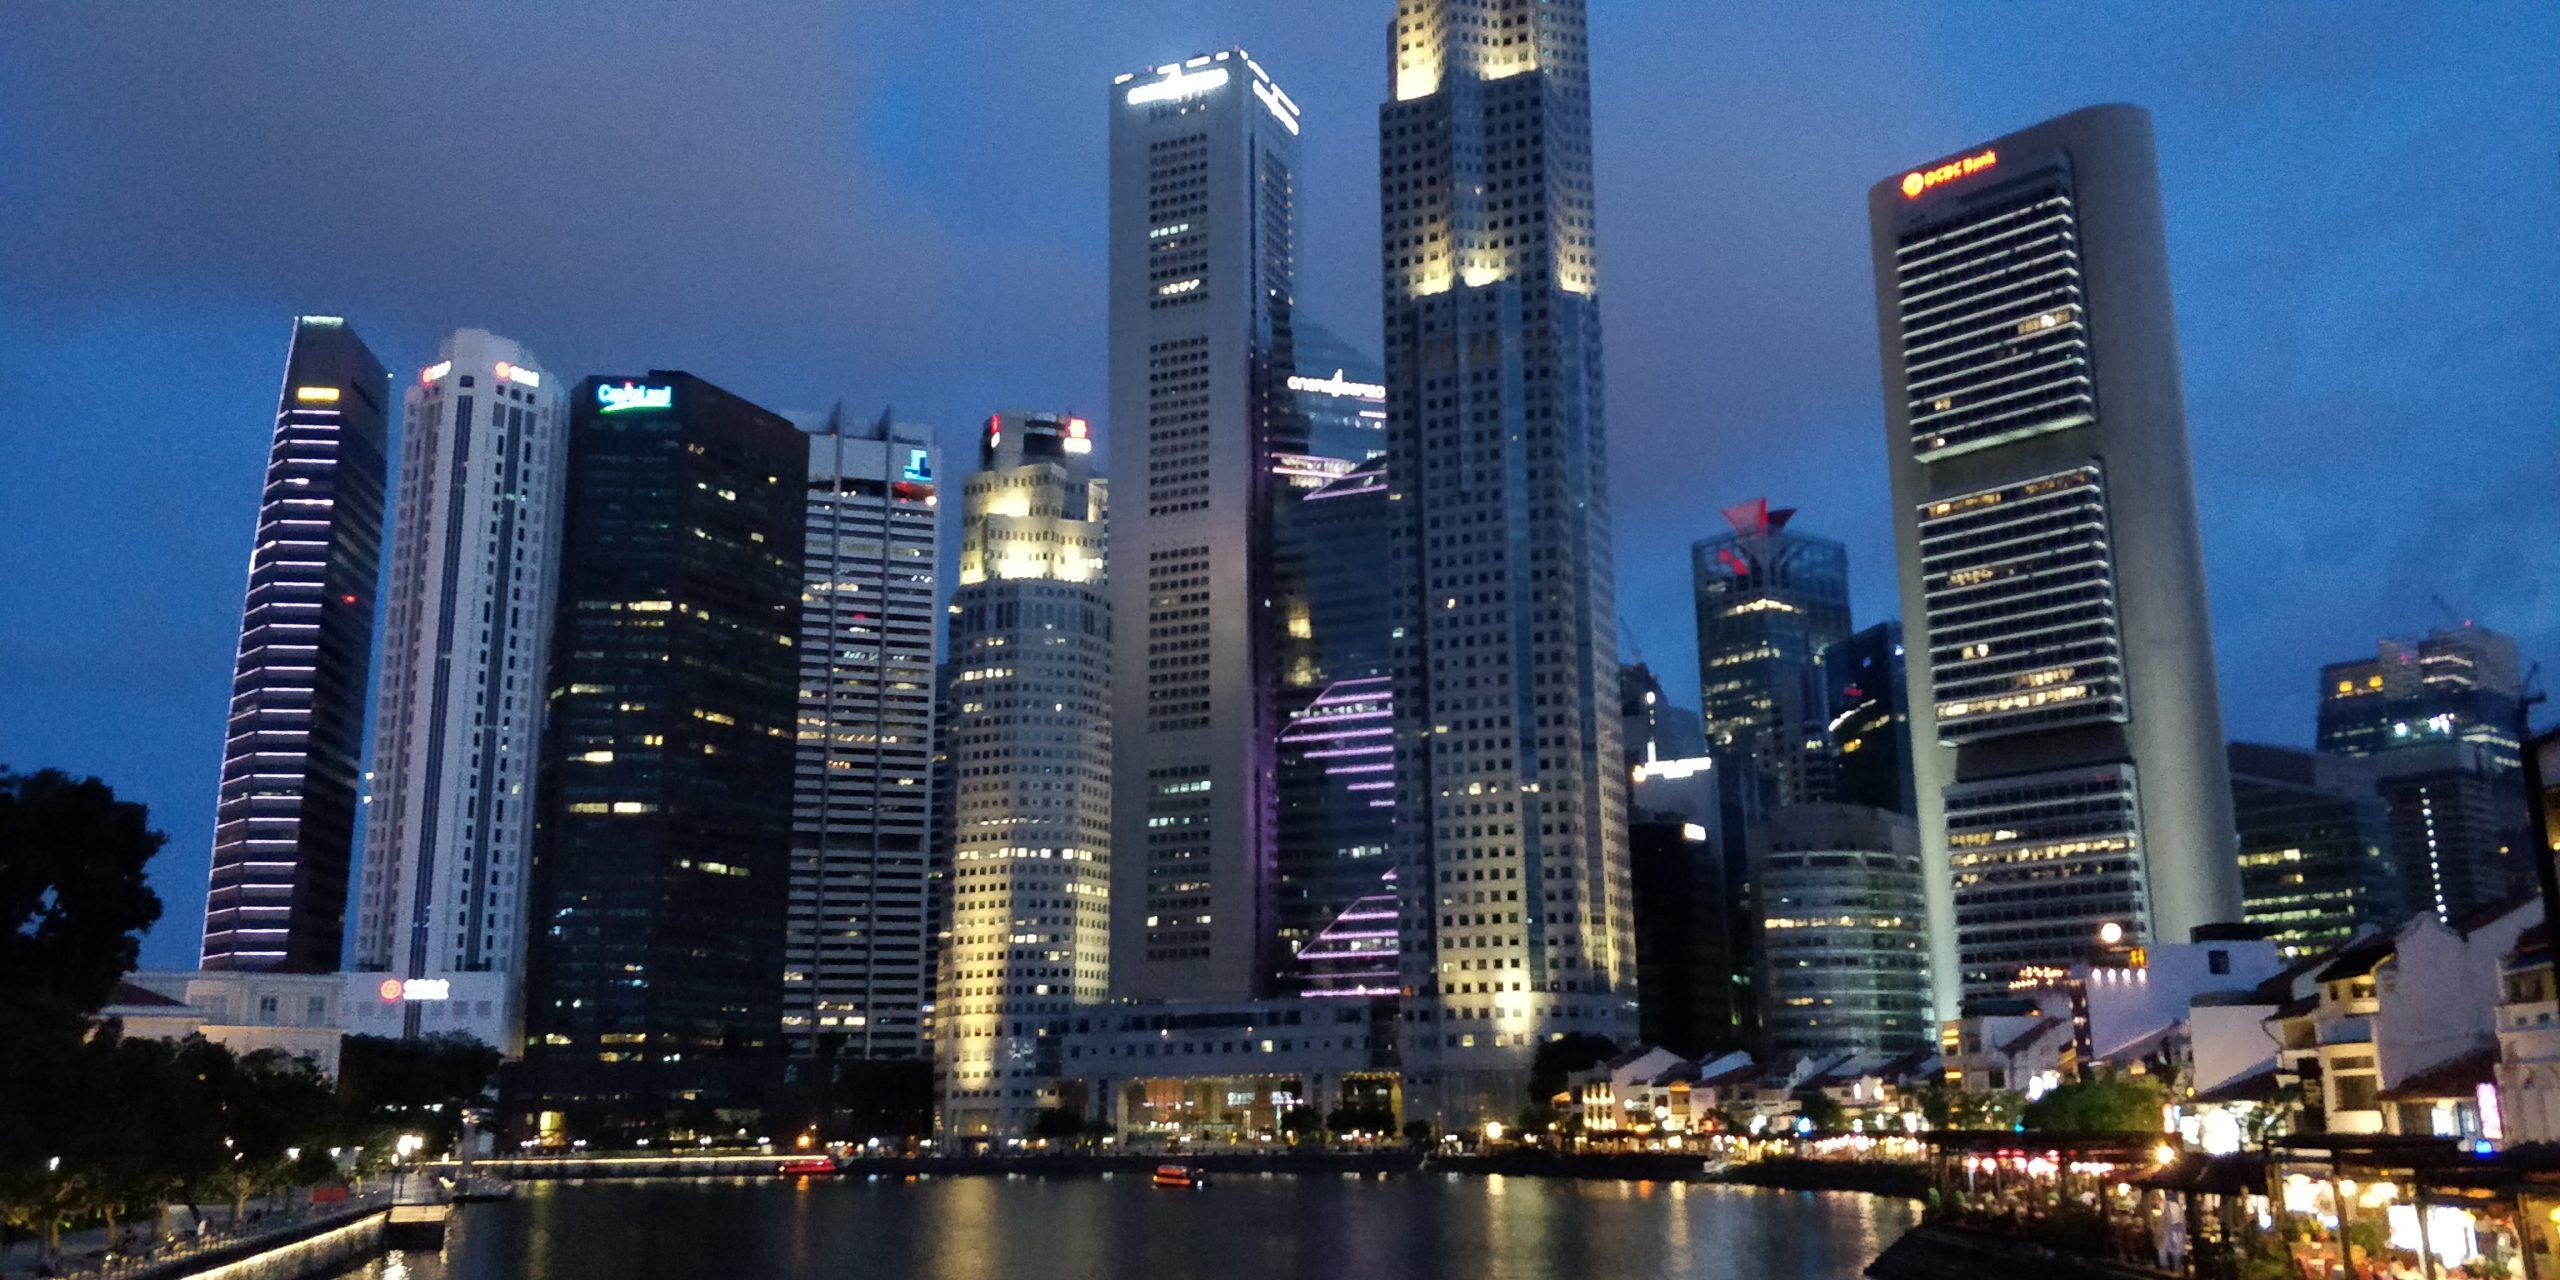 DIATEAM in SINGAPORE & BANGKOK during EU-GATEWAY 2018 ICT Forum